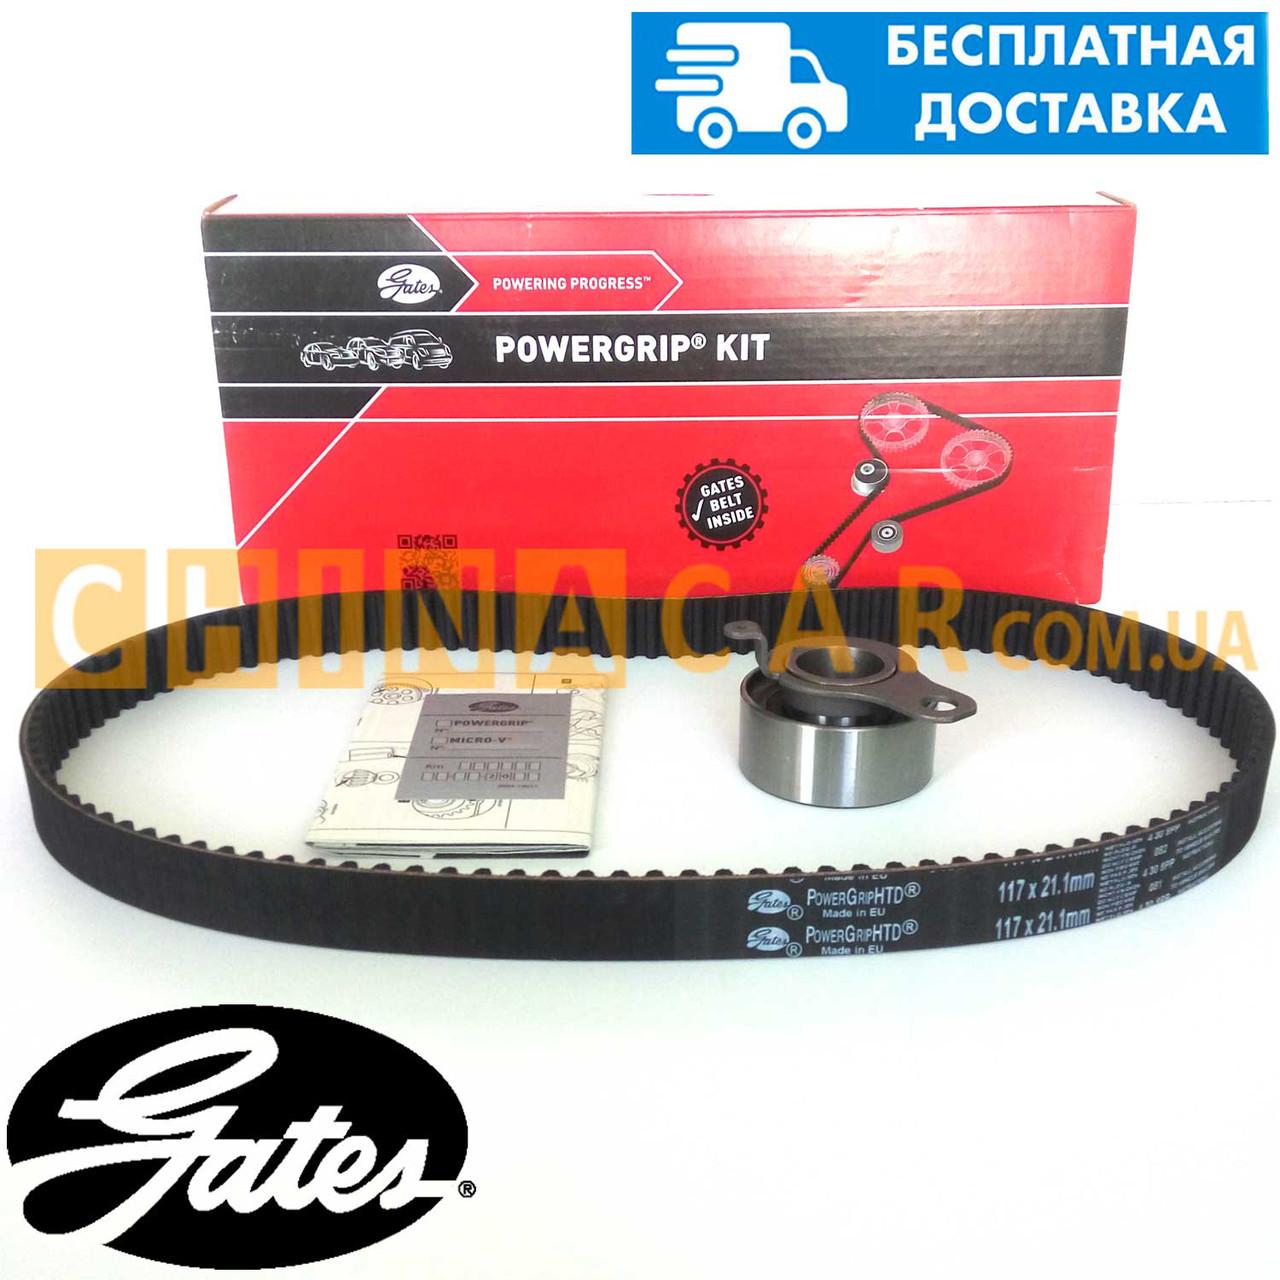 Комплект ГРМ GATES, Lifan 320 (Smily) Лифан Смайли - LF479Q1-1025016A-K